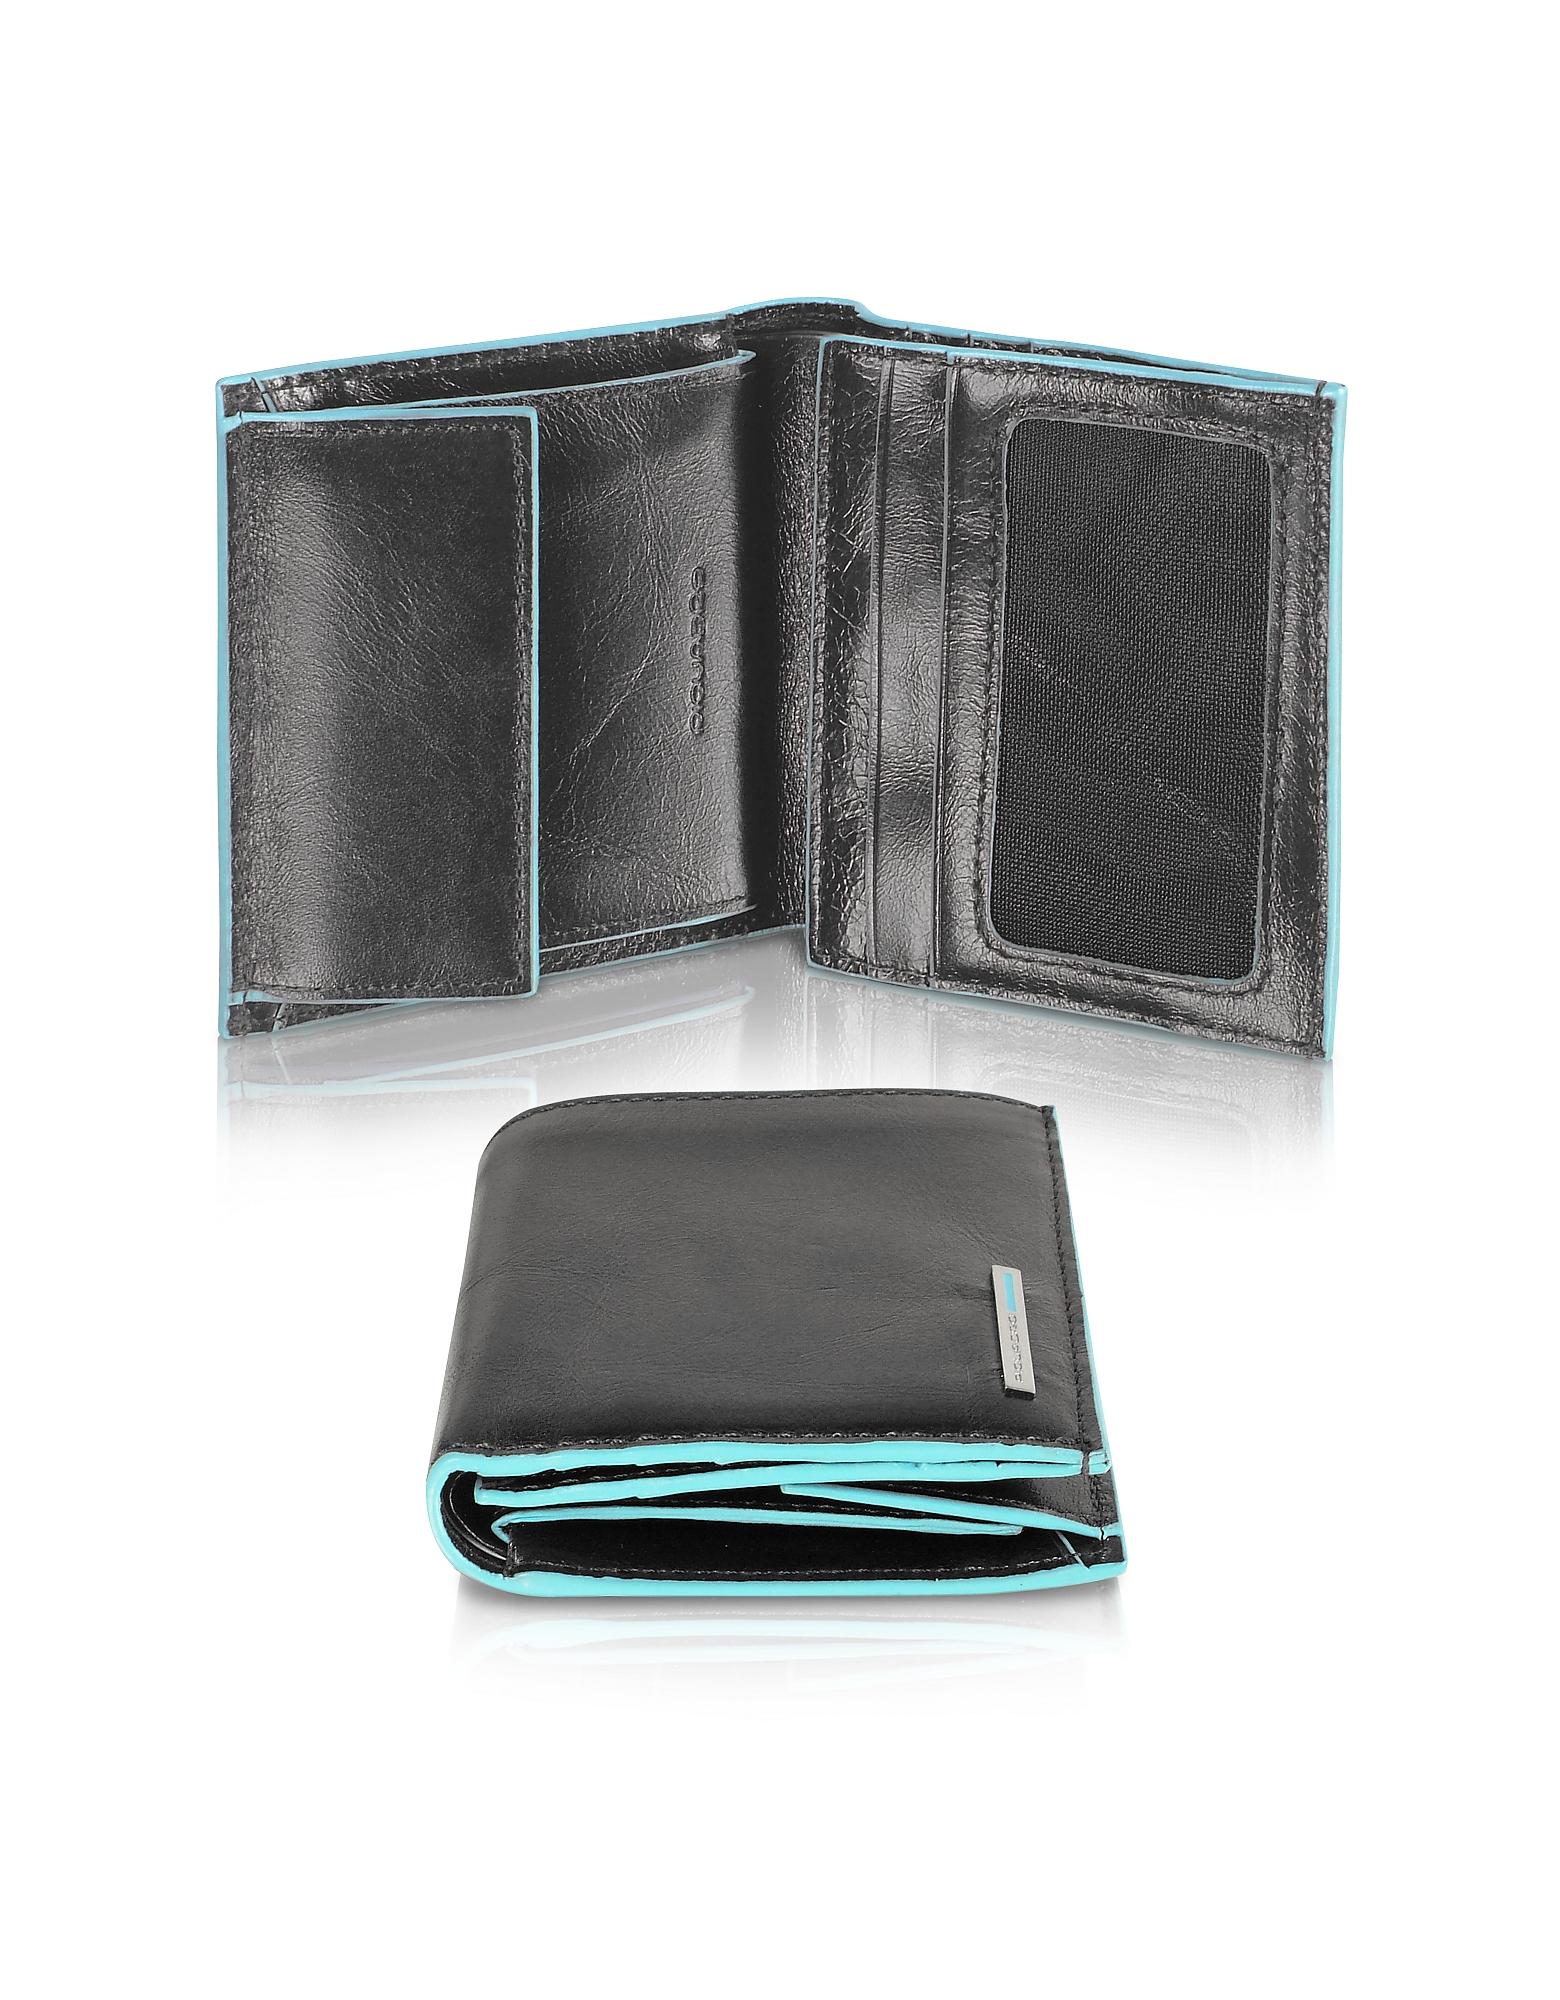 Piquadro Wallets, Blue Square-Men's Leather ID Wallet